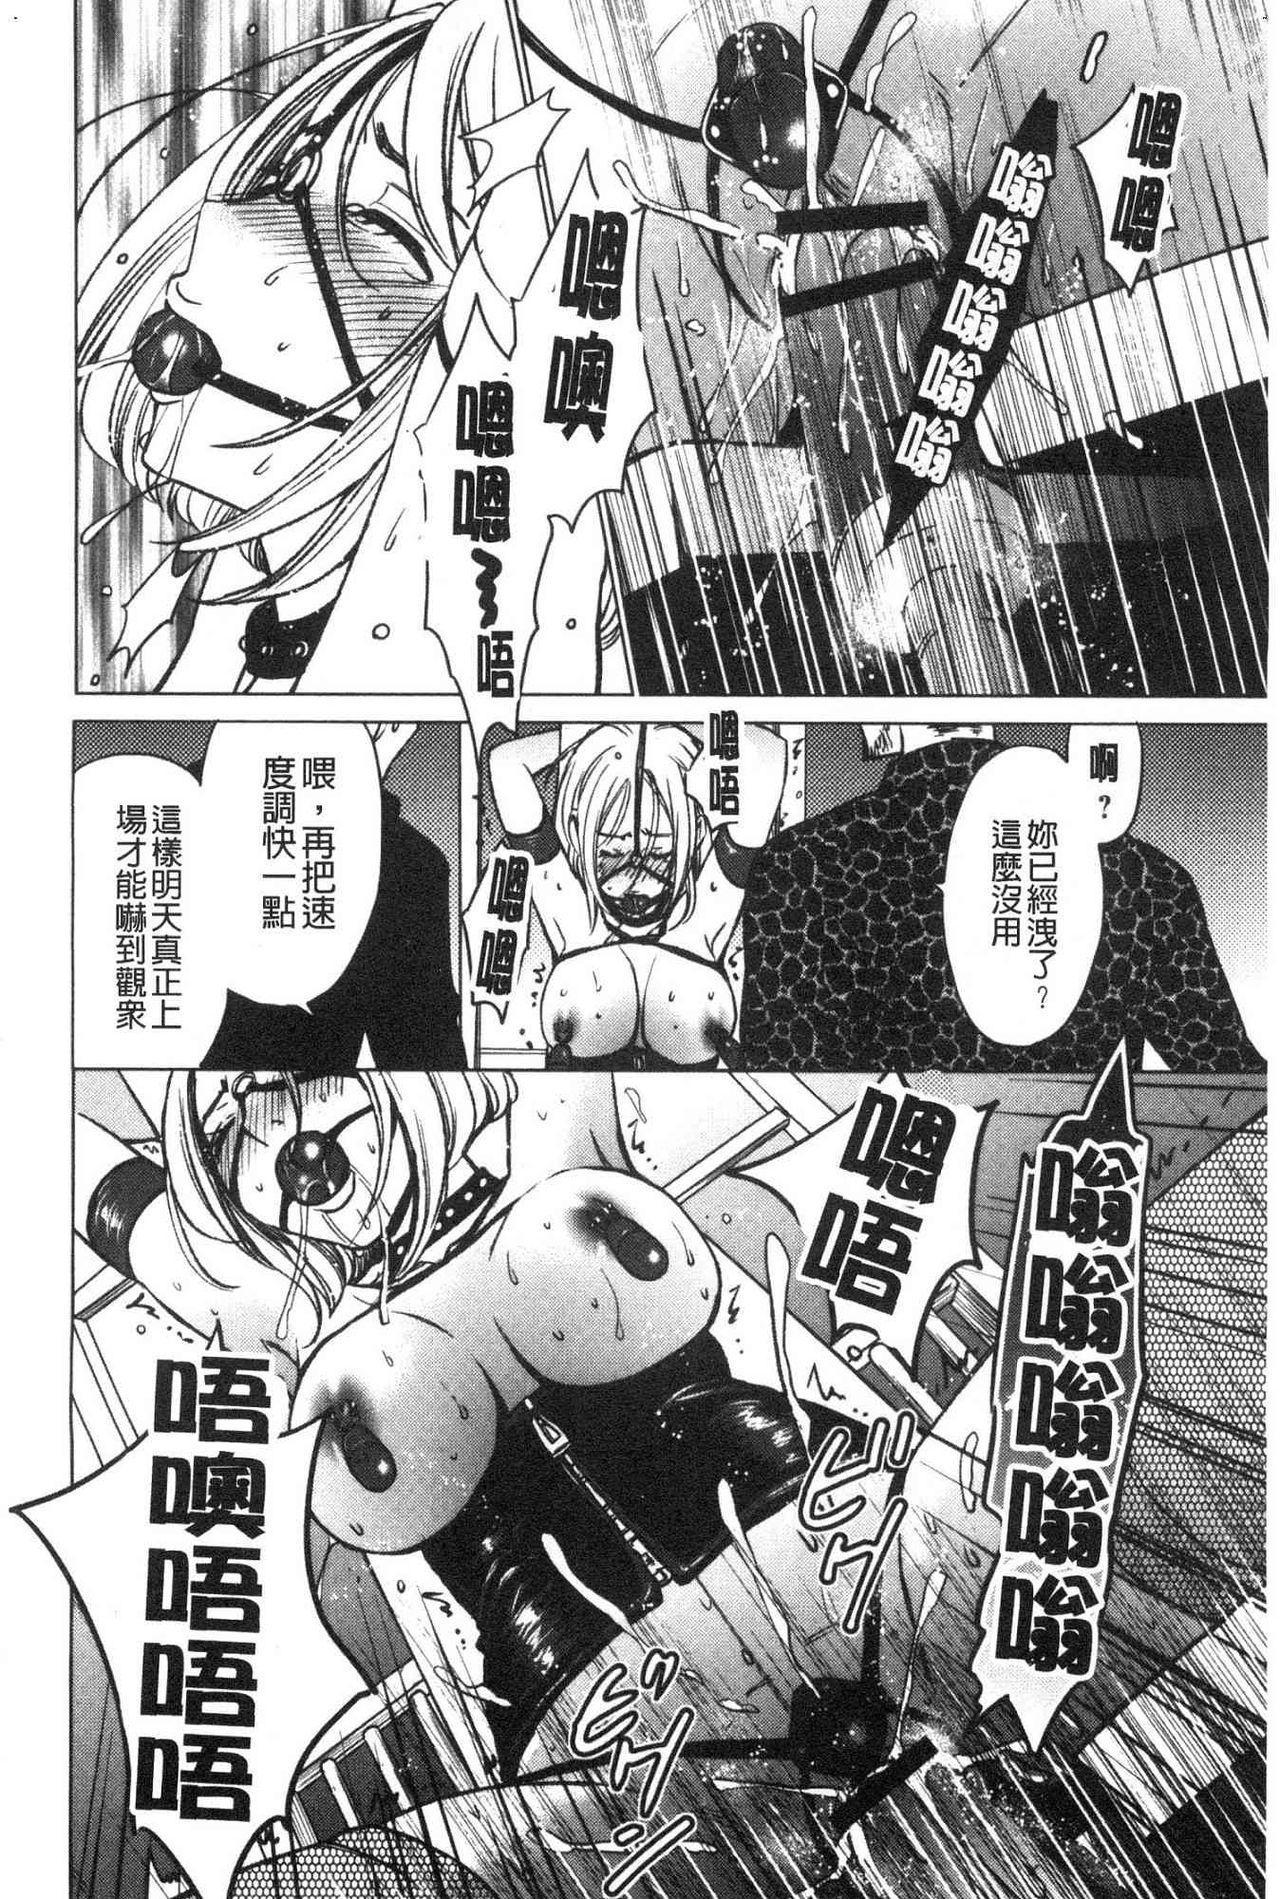 [Gotoh Akira]  21-ji no Onna ~Camera no Mae no Mesuinu~ 2 | 21時之女 ~鏡頭前的牝犬~ 2 [Chinese] 153